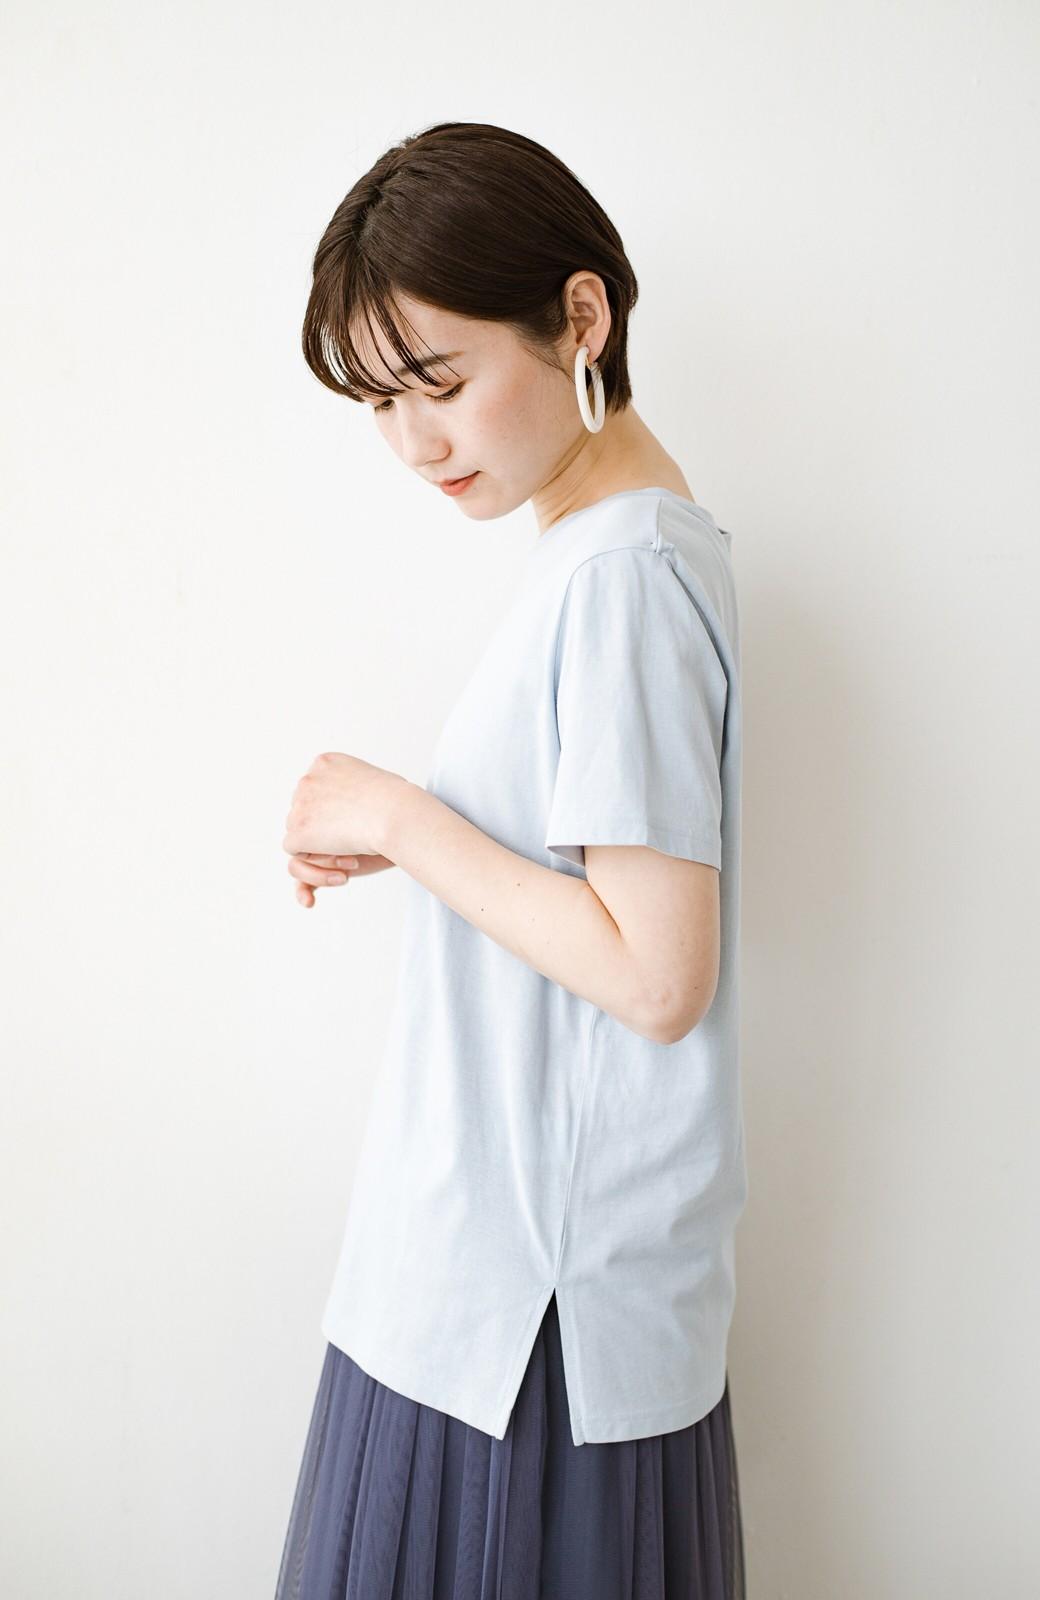 haco! 汗染み軽減加工で安心!1枚でも重ね着にも便利なシンプルTシャツ by ZAMPA <サックスブルー>の商品写真11